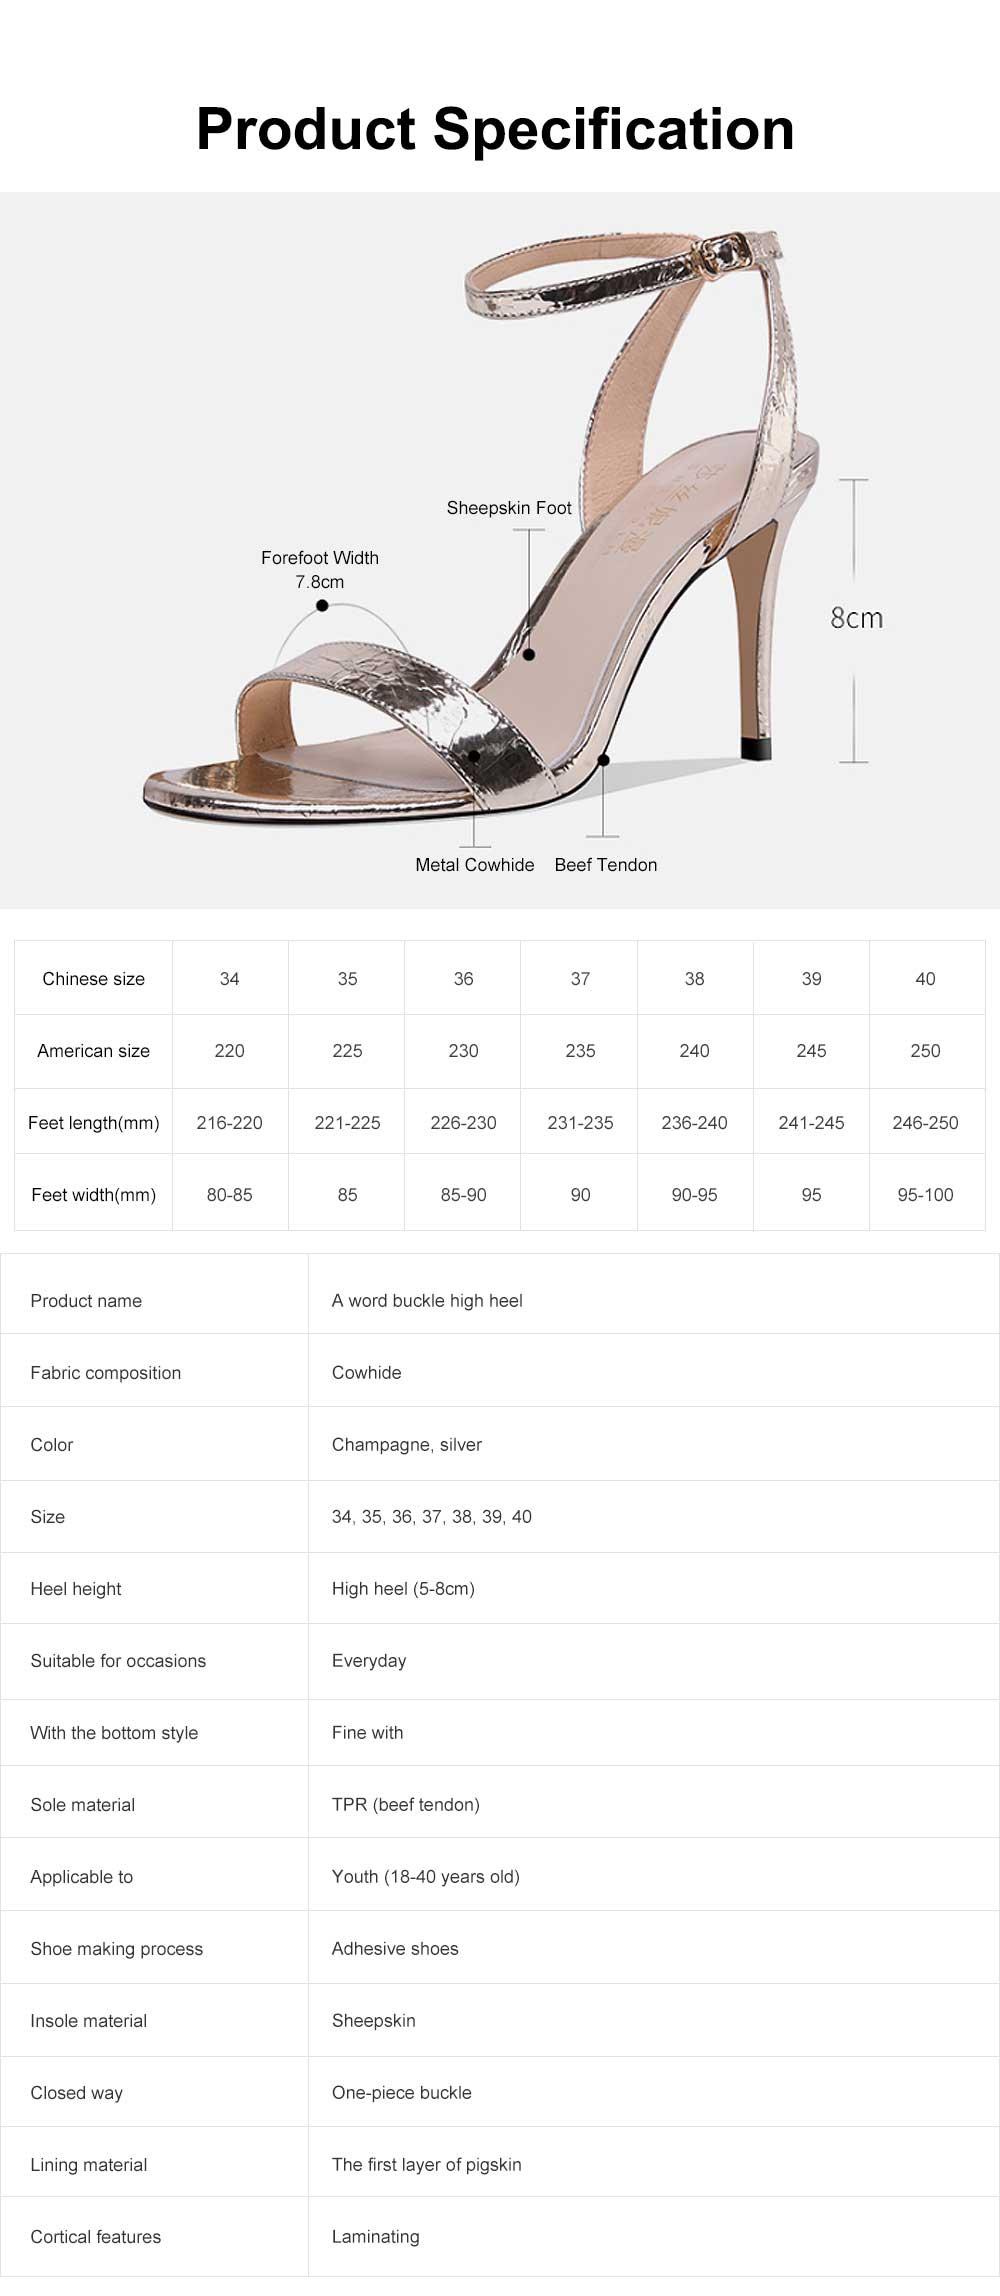 Summer High Heel Sandals with Word Buckle Roman Sandals, Women Dress Shoes Sexy High Heels 6